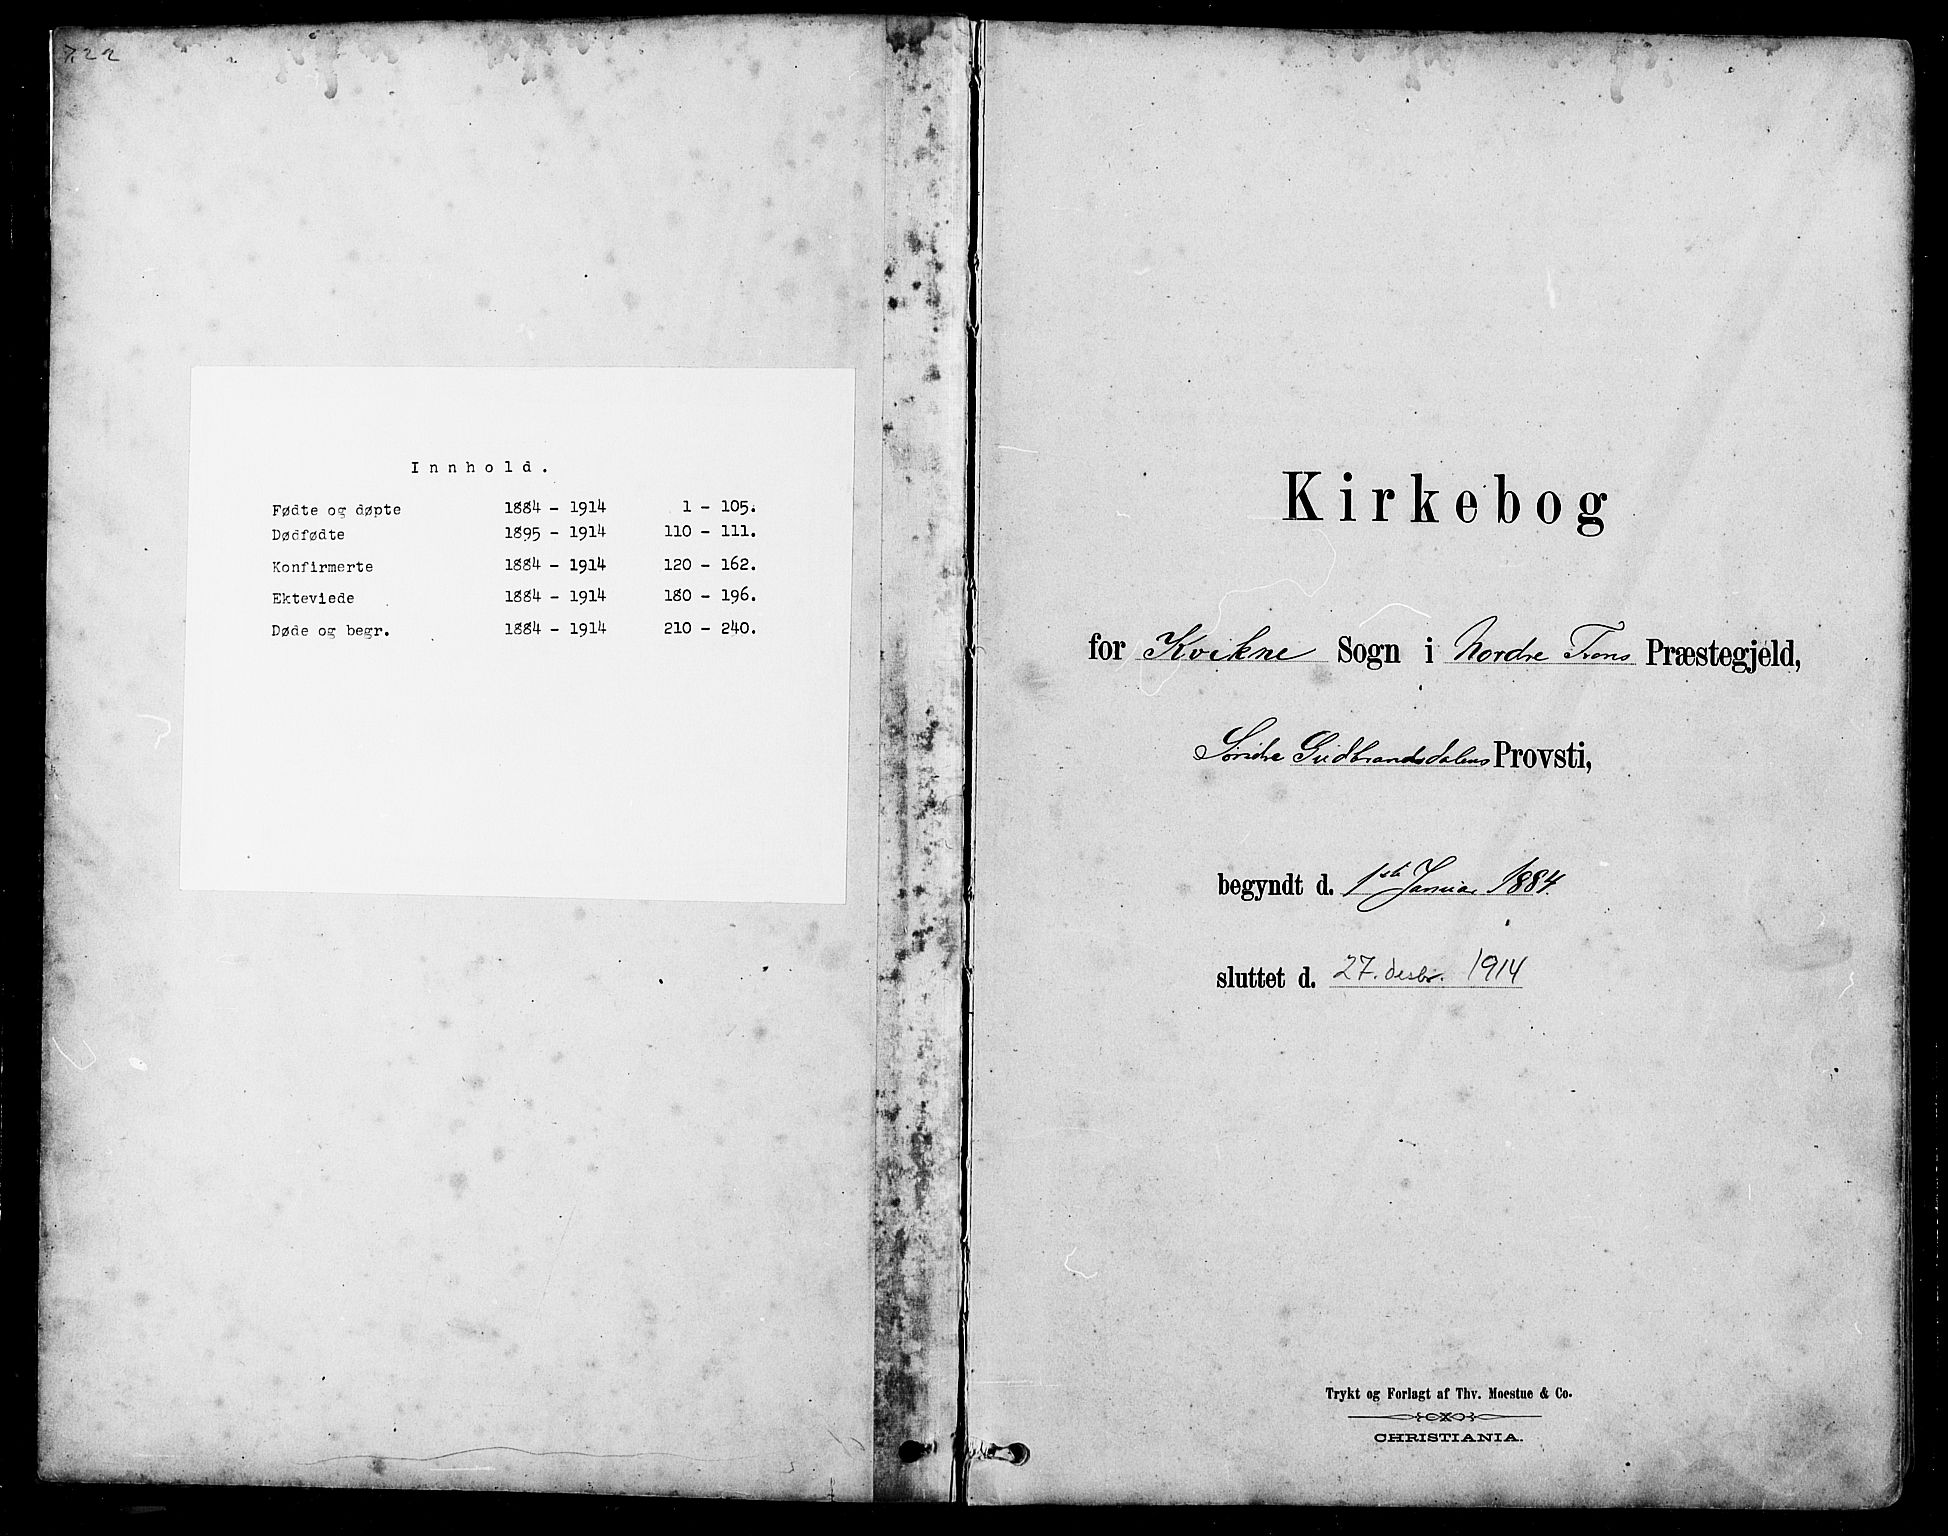 SAH, Nord-Fron prestekontor, Klokkerbok nr. 5, 1884-1914